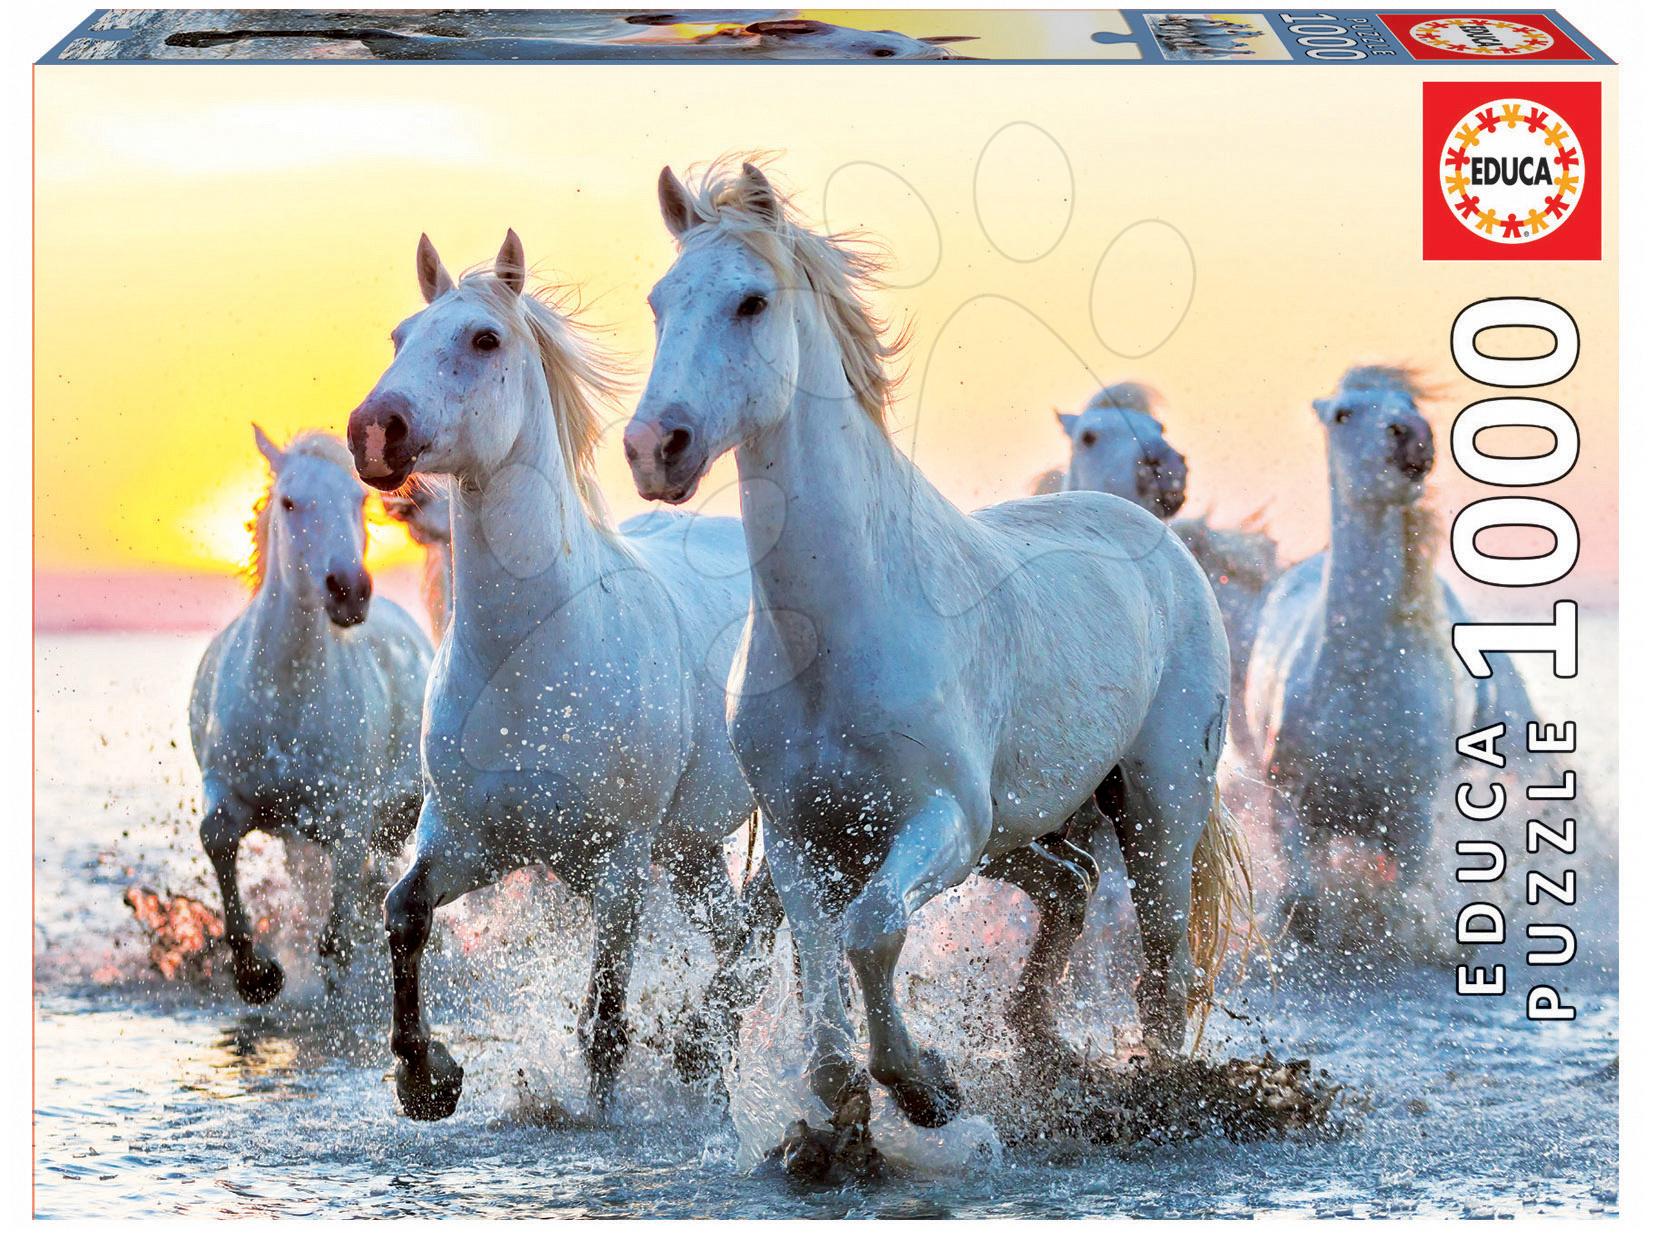 Puzzle Genuine White Horses at Sunset slunce Educa 1000 dílů od 11 let